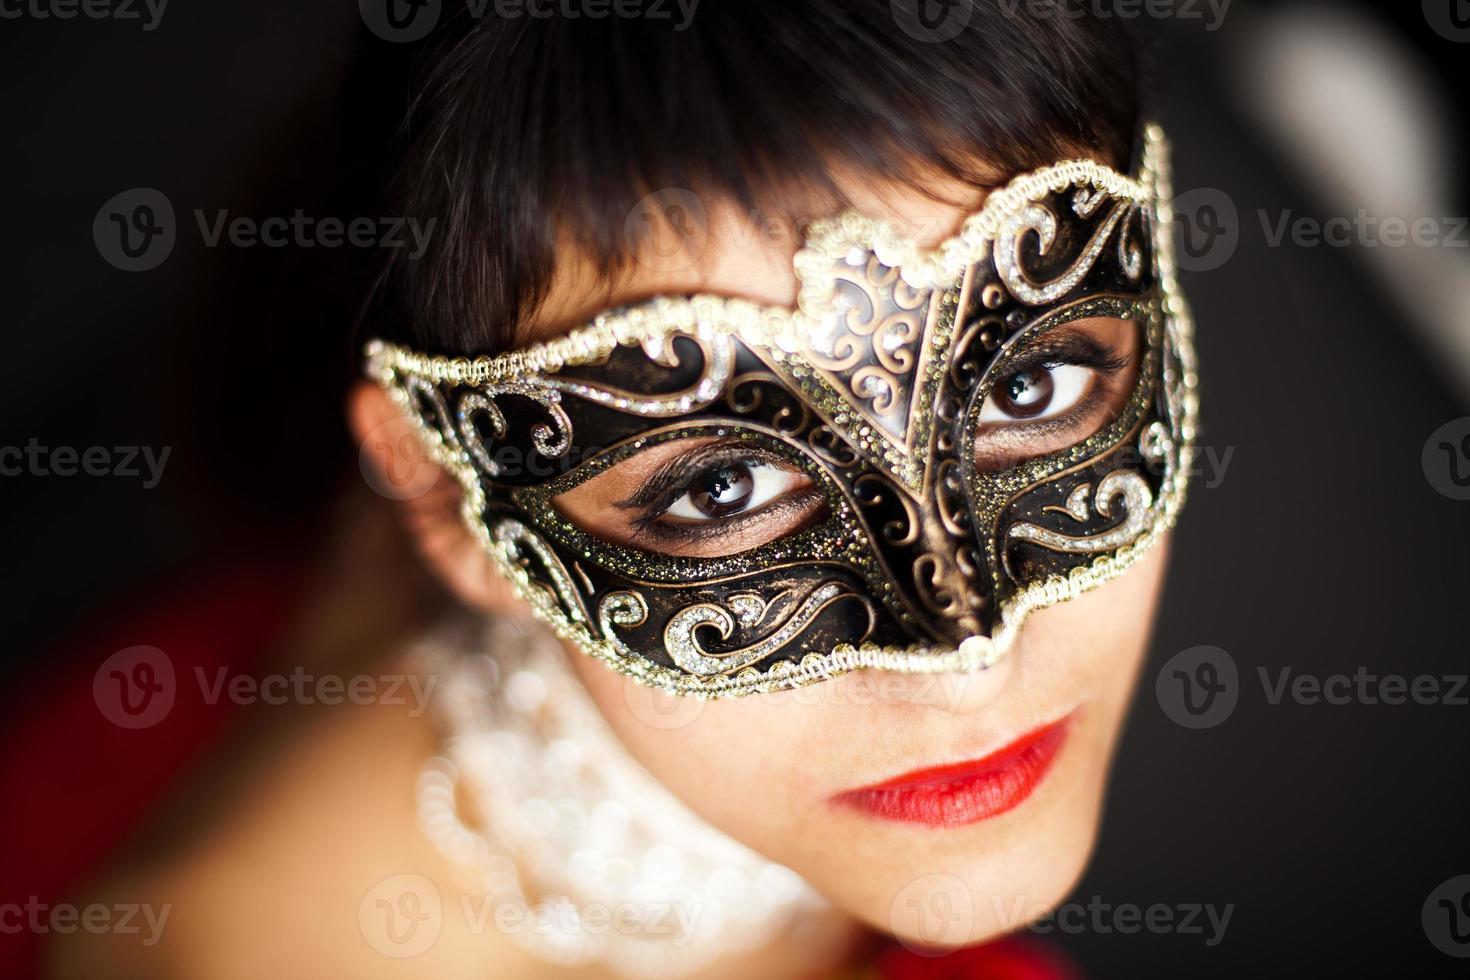 mulher usando máscara, olhando para cima foto